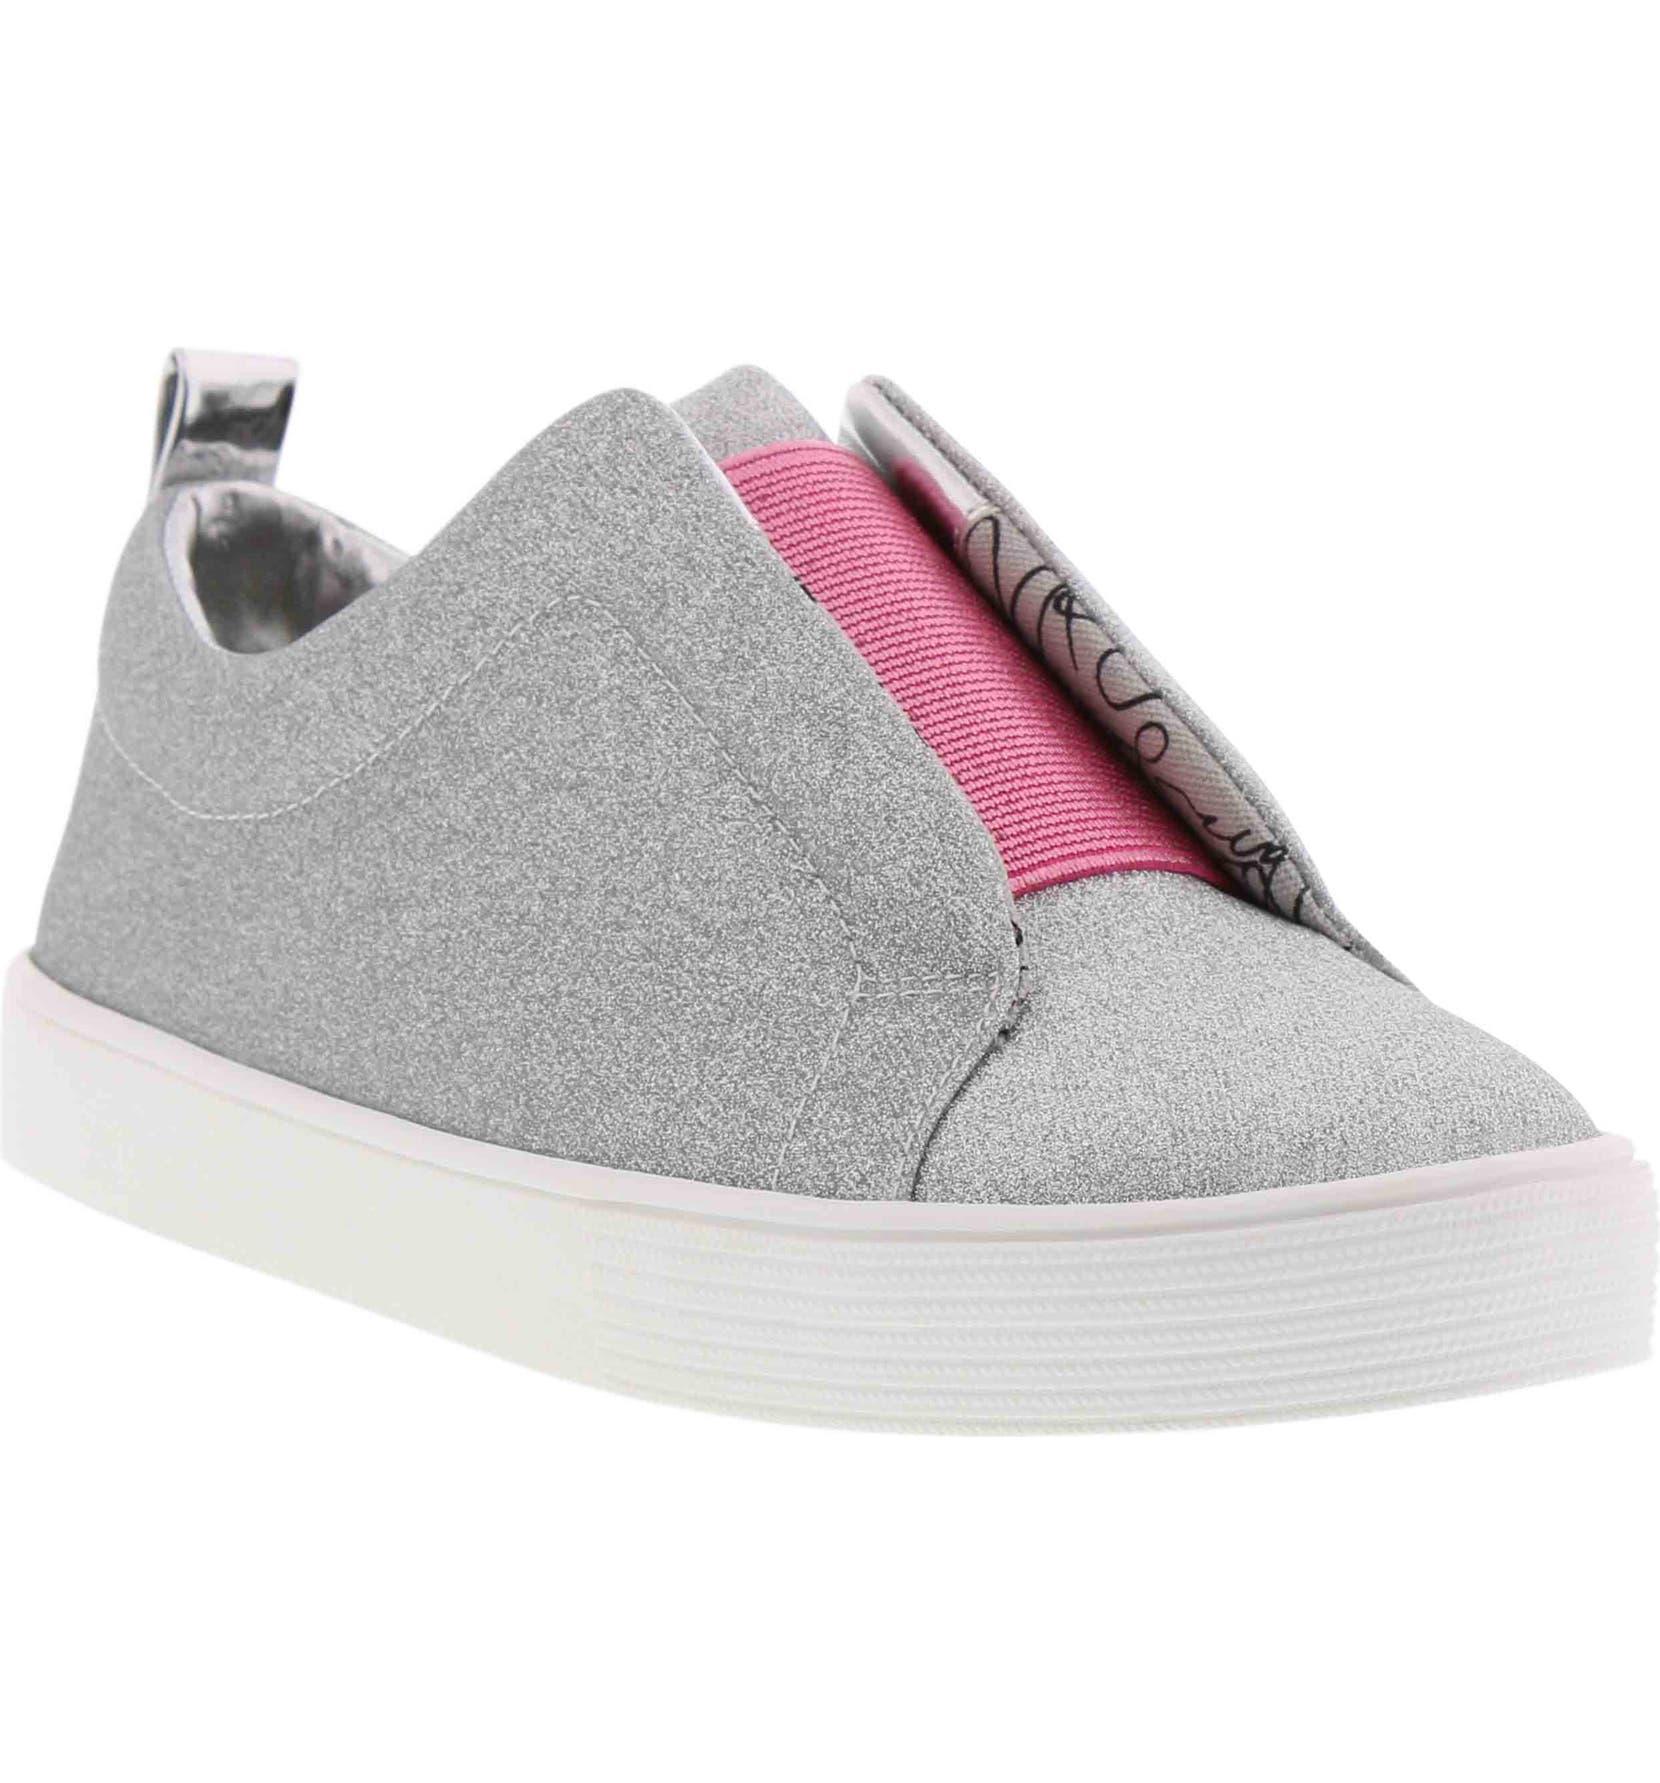 88078c2c6143bd Sam Edelman Bella Emma Slip-On Sneaker (Toddler